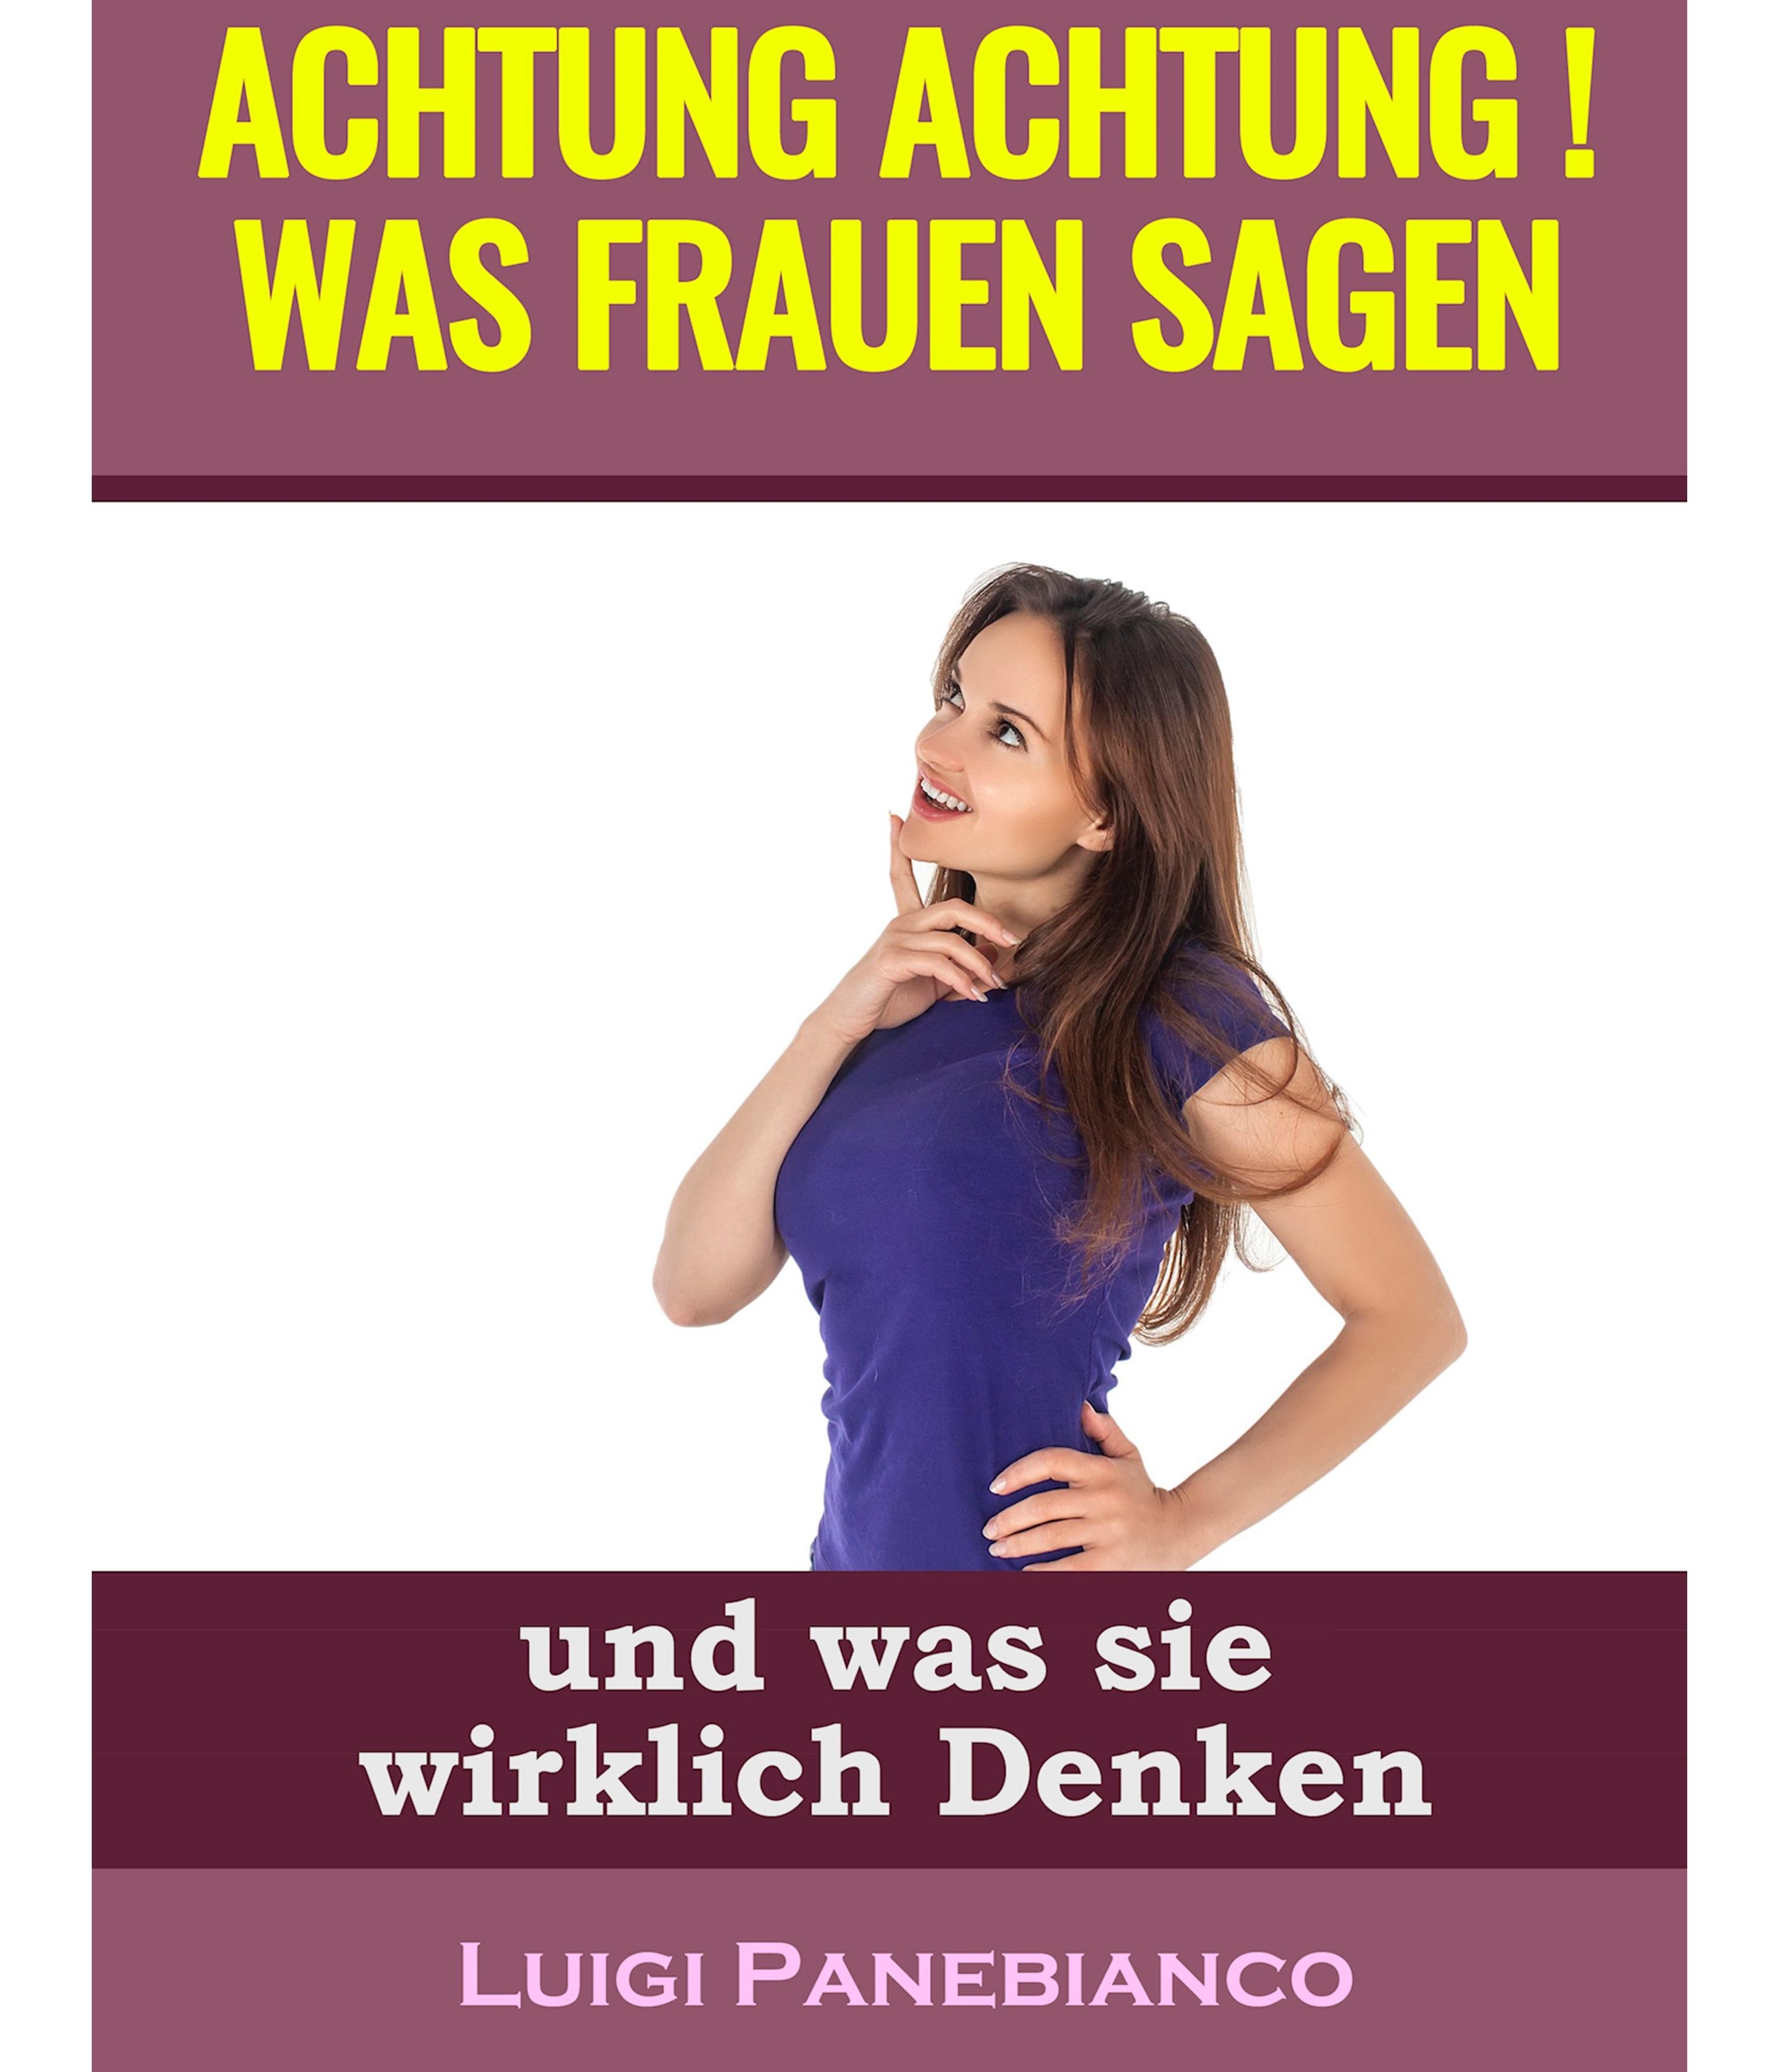 цена на Luigi Panebianco Achtung Achtung Was Frauen sagen